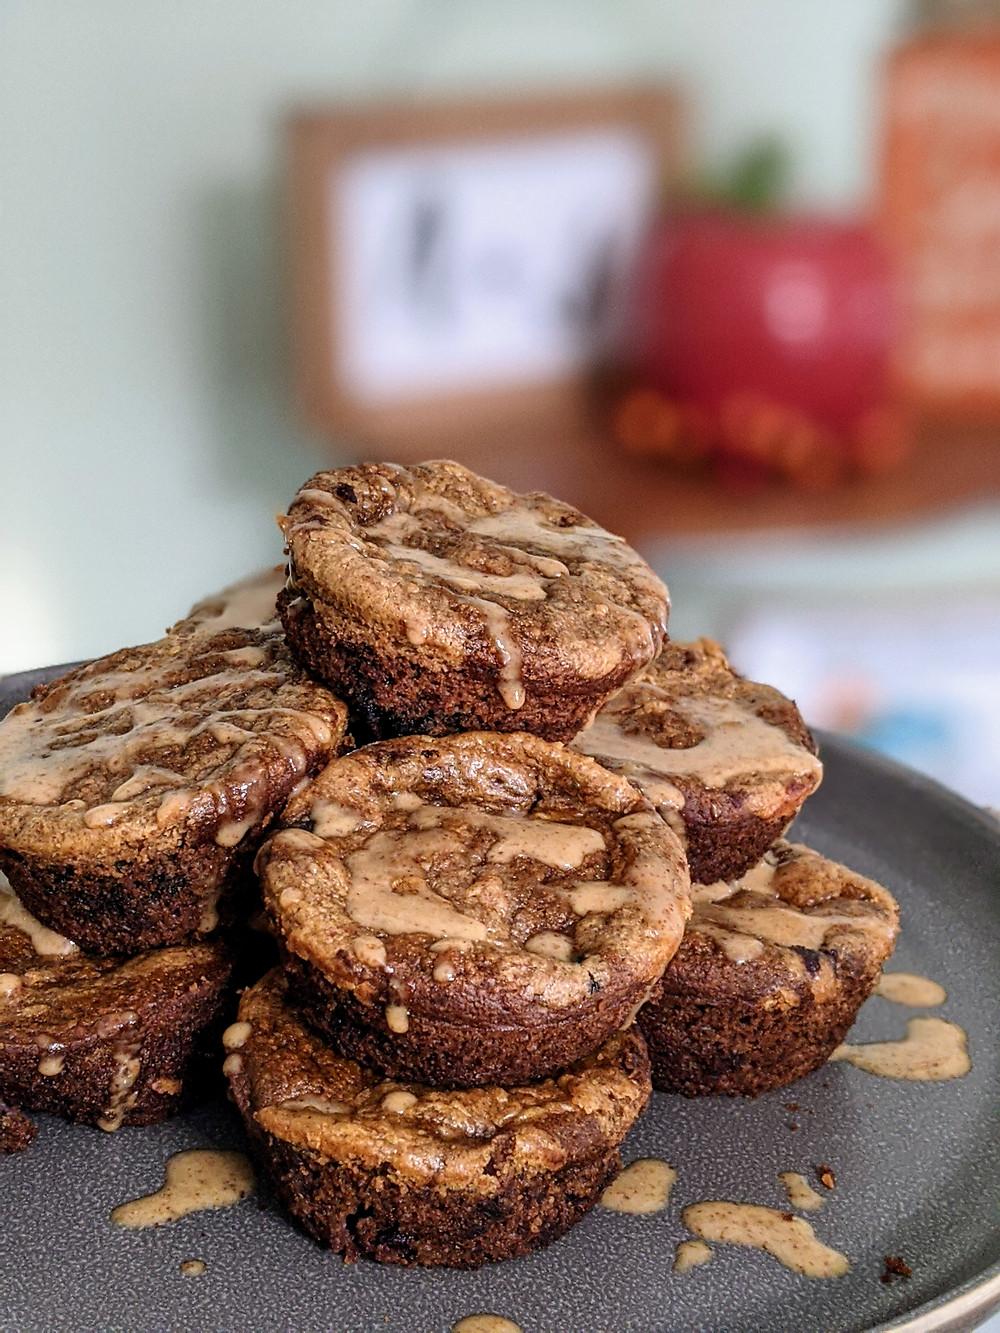 Blueberry Banana Bread Bites - Amanda MacGregor - Joseph Centineo - food allergy recipes